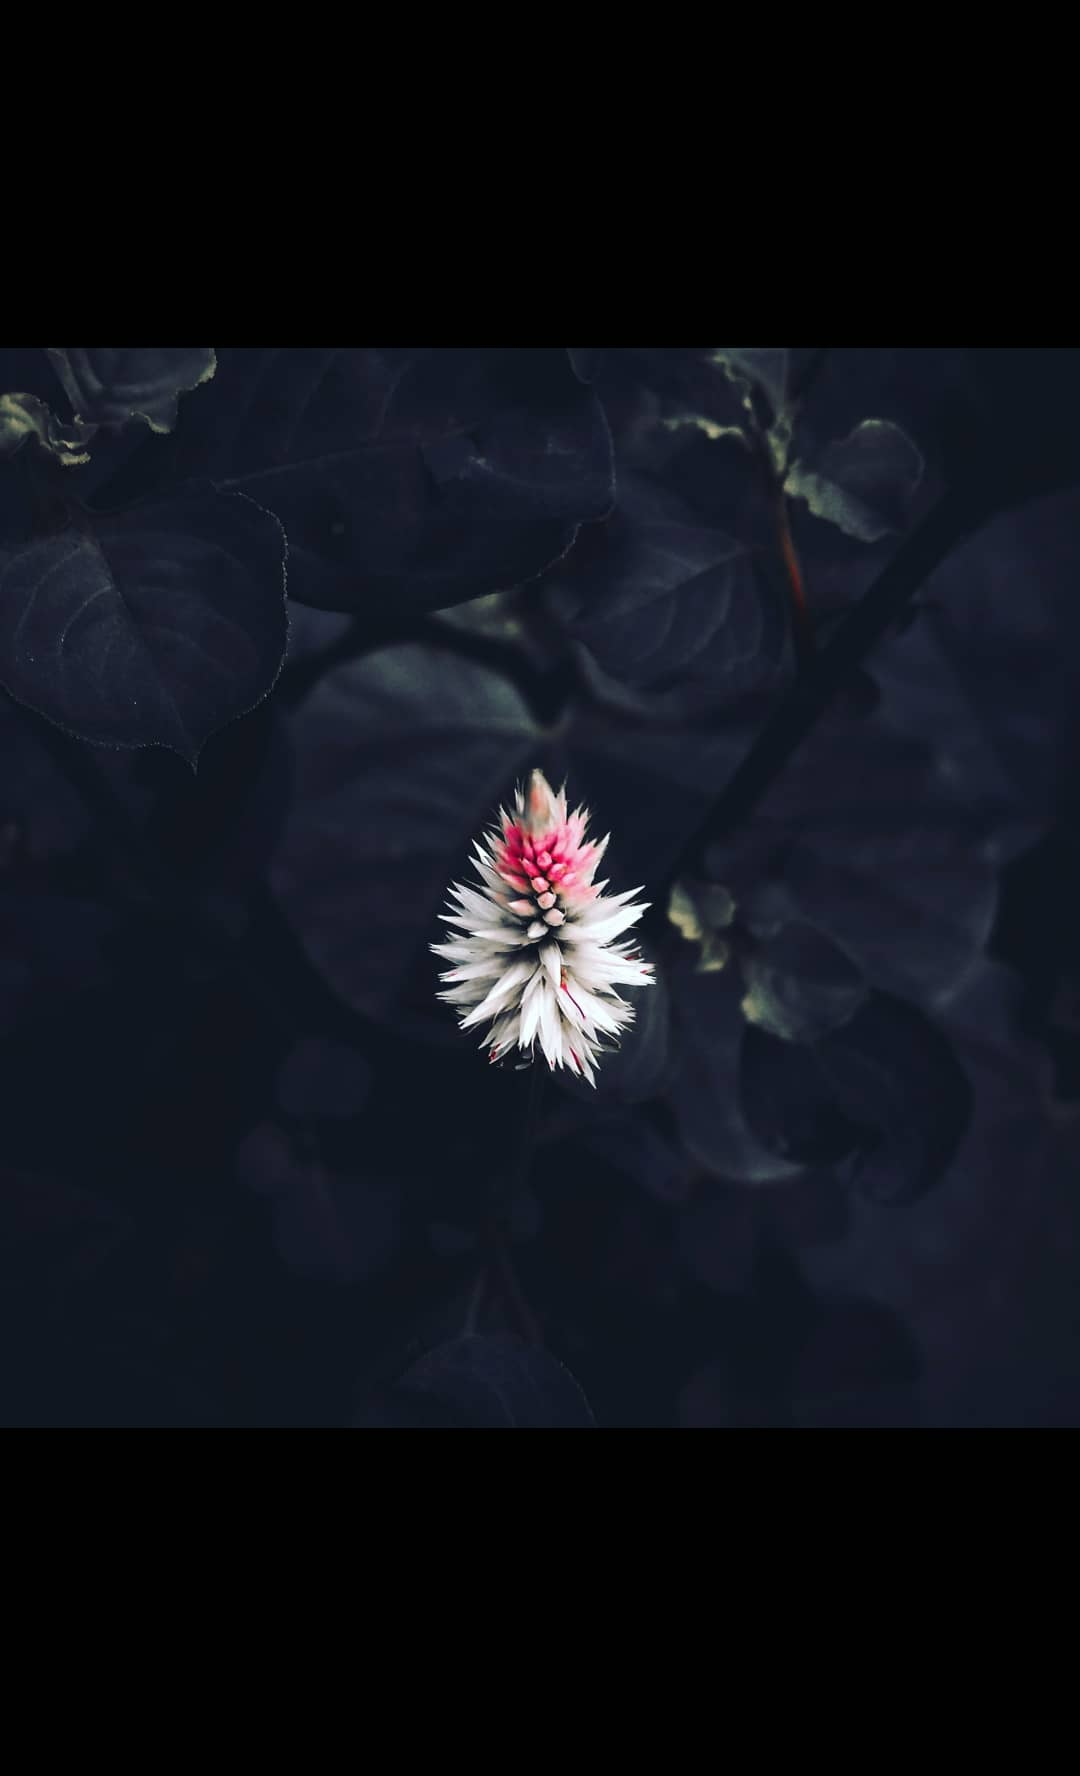 Untitled by Sidharth madhesiya